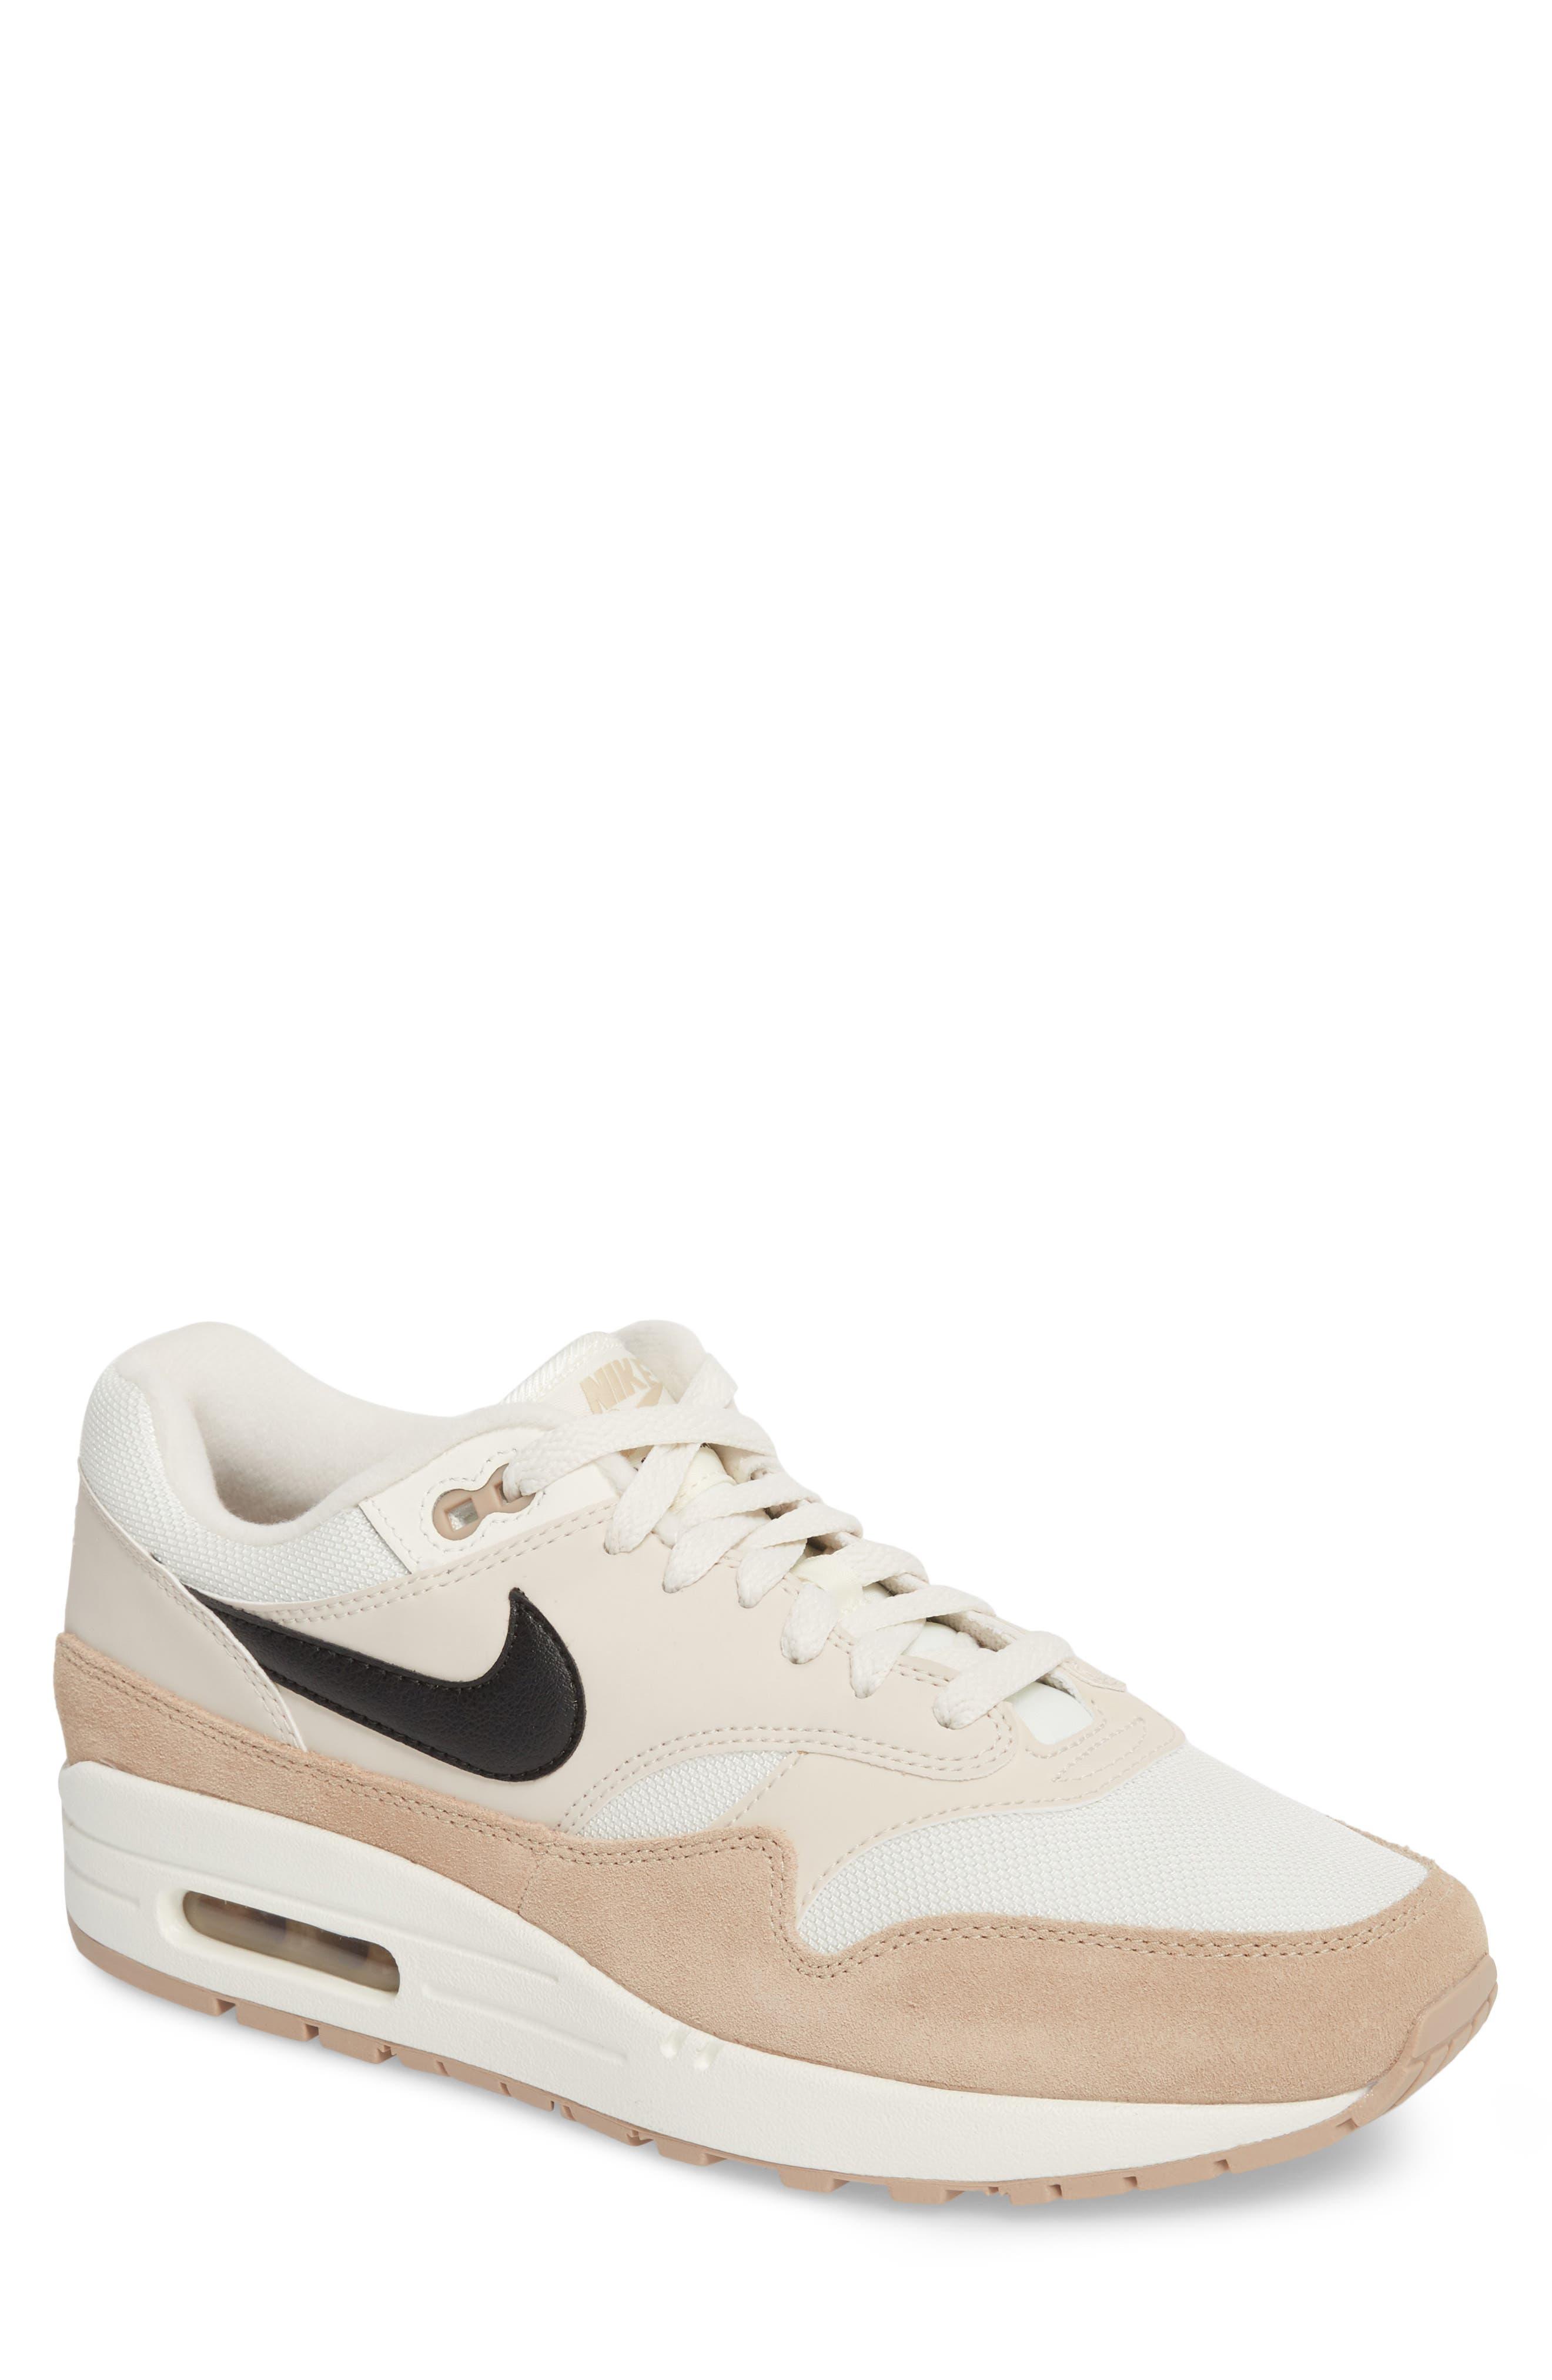 5ed87d999bd8c ... cheapest internationalist pinkgrey nike air max 1 sneaker men . cbfc3  a1b2b